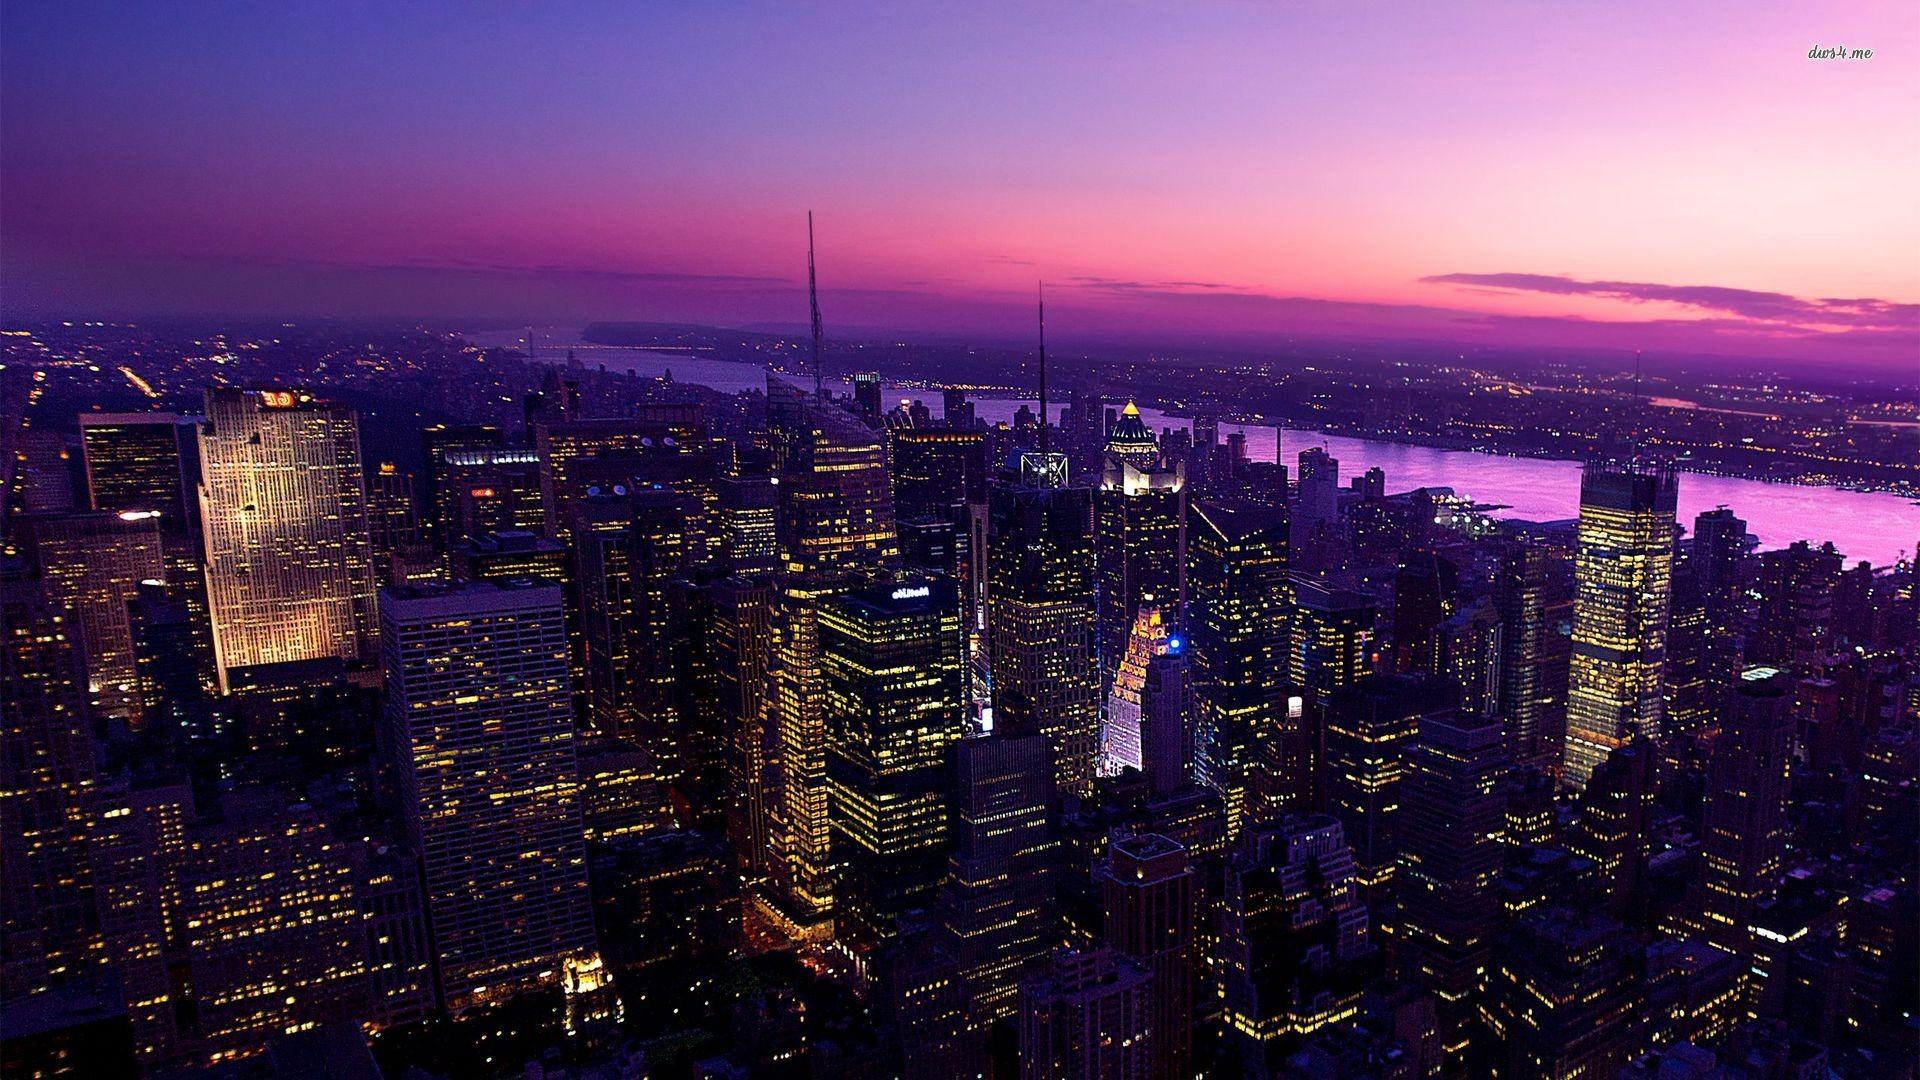 New York At Night Wallpaper 67 Images